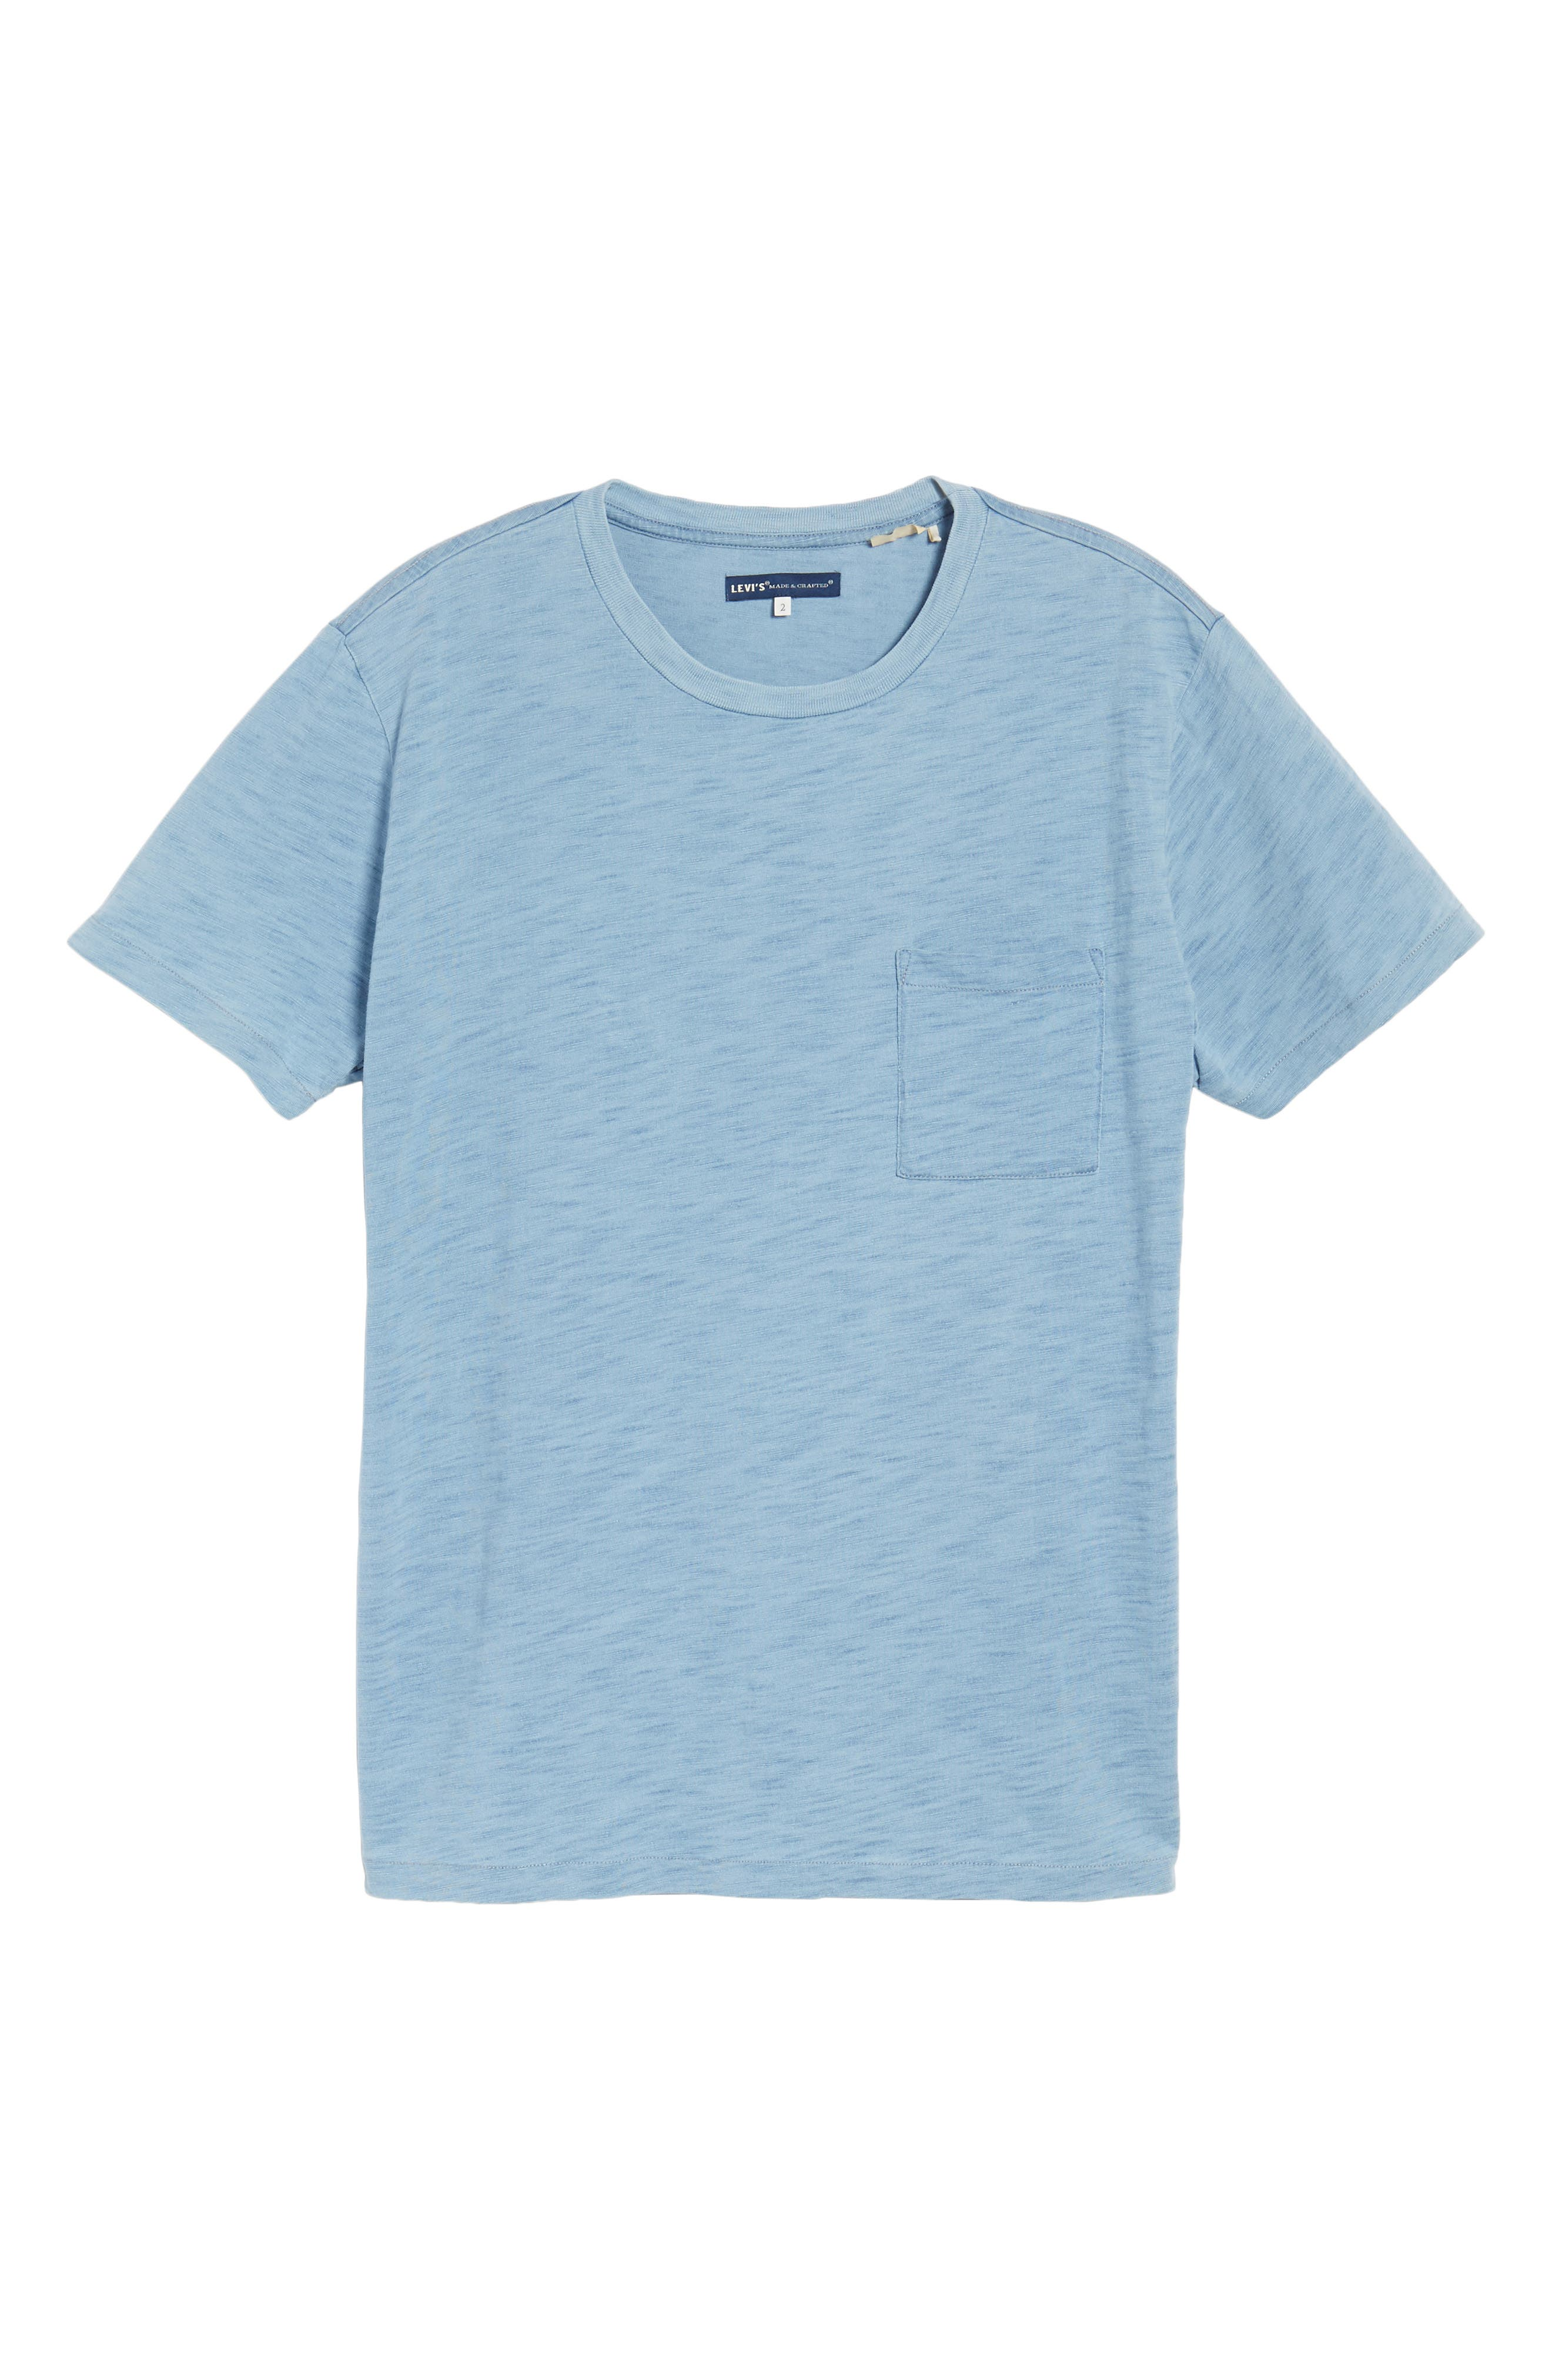 Pocket T-Shirt,                             Alternate thumbnail 6, color,                             Washed Indigo